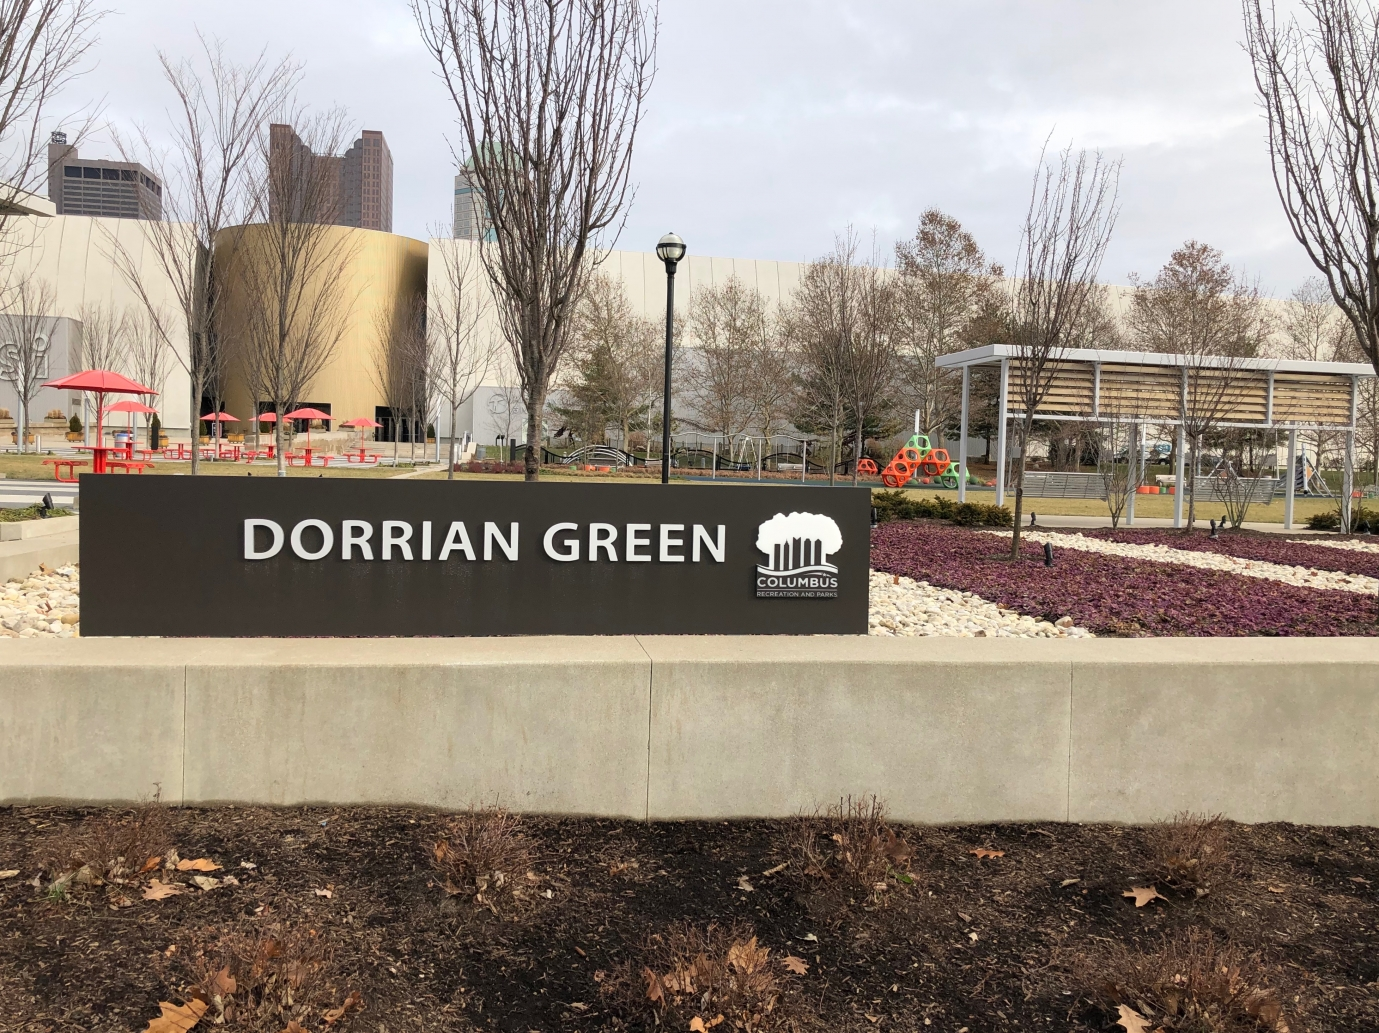 Dorrian Green outside COSI